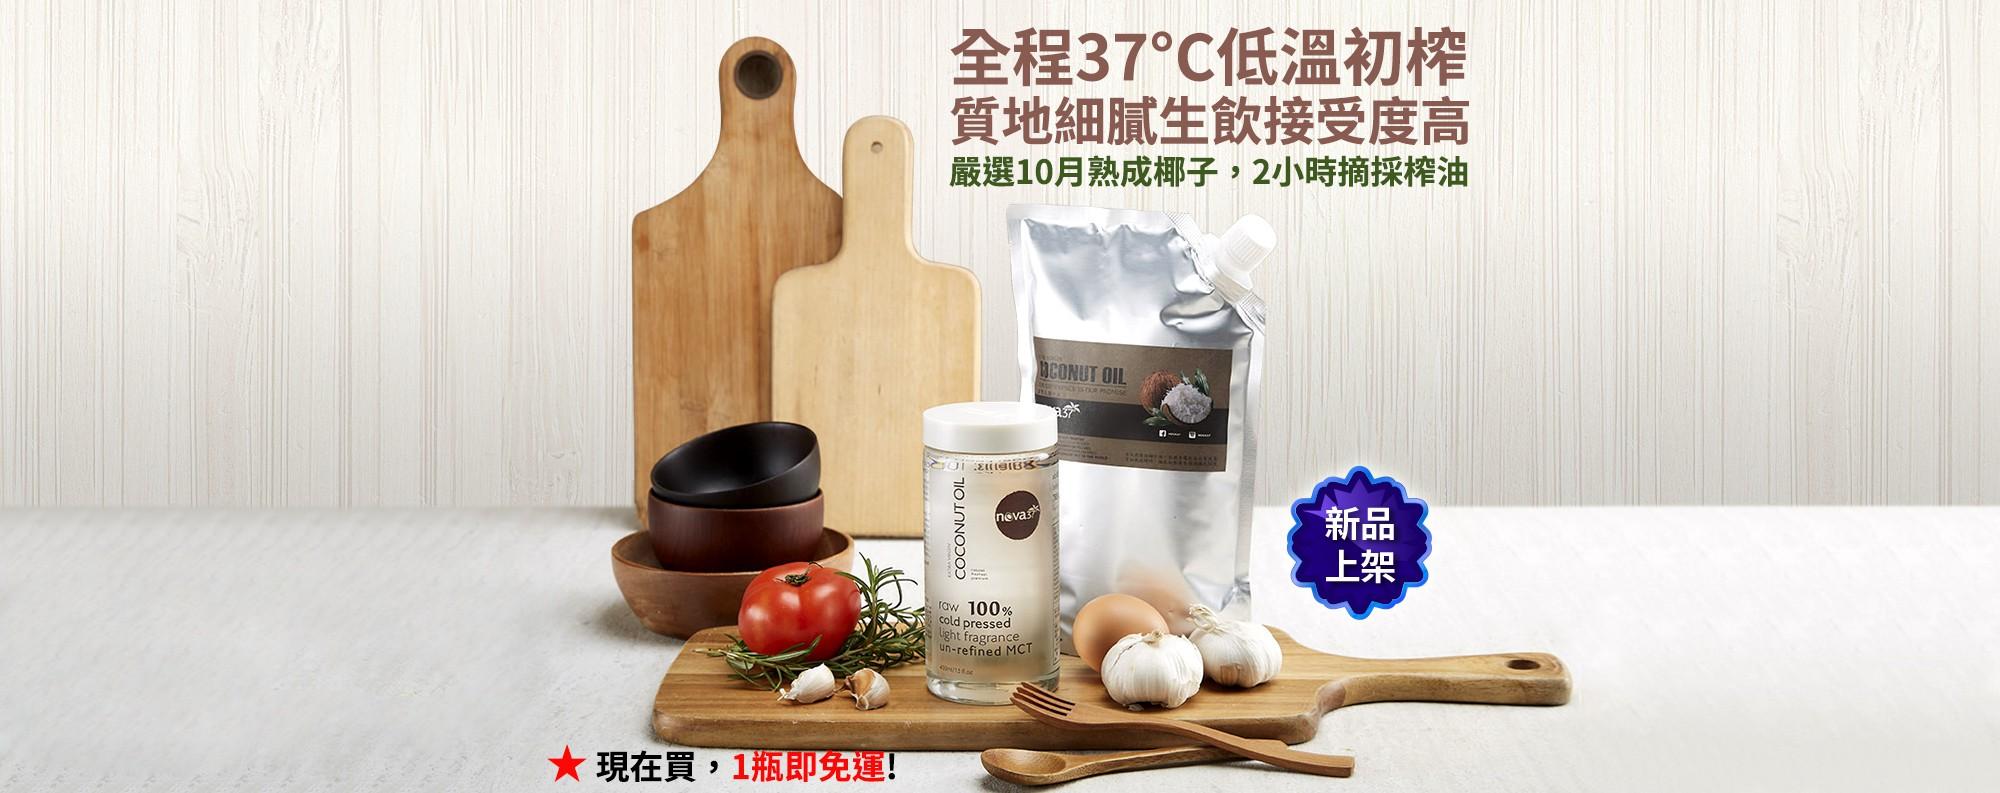 nova37冷壓鮮榨純淨椰子油